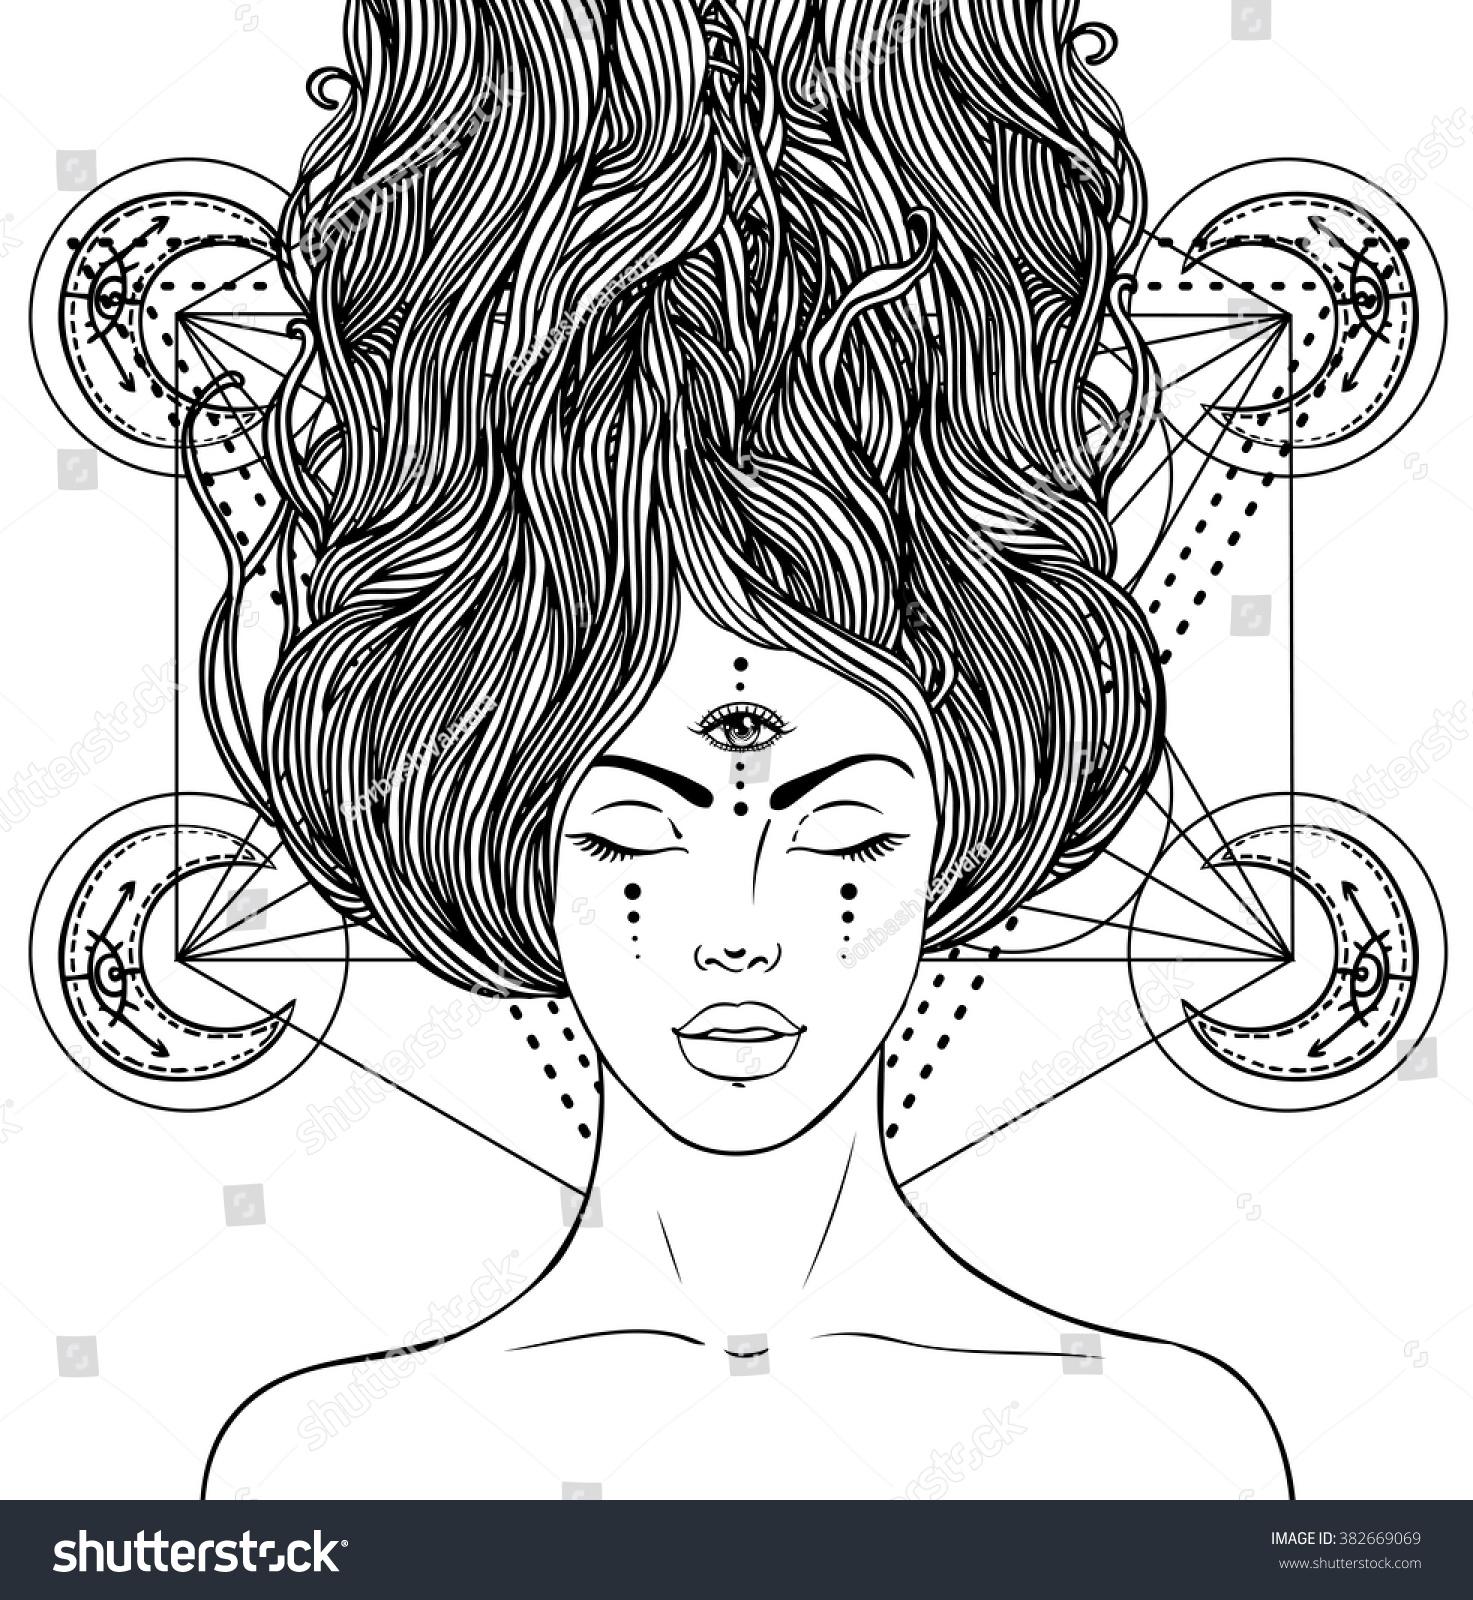 Magic Night Fairy With 3rd Eye Hand Drawn Portrait Of A Beautiful Shaman Woman